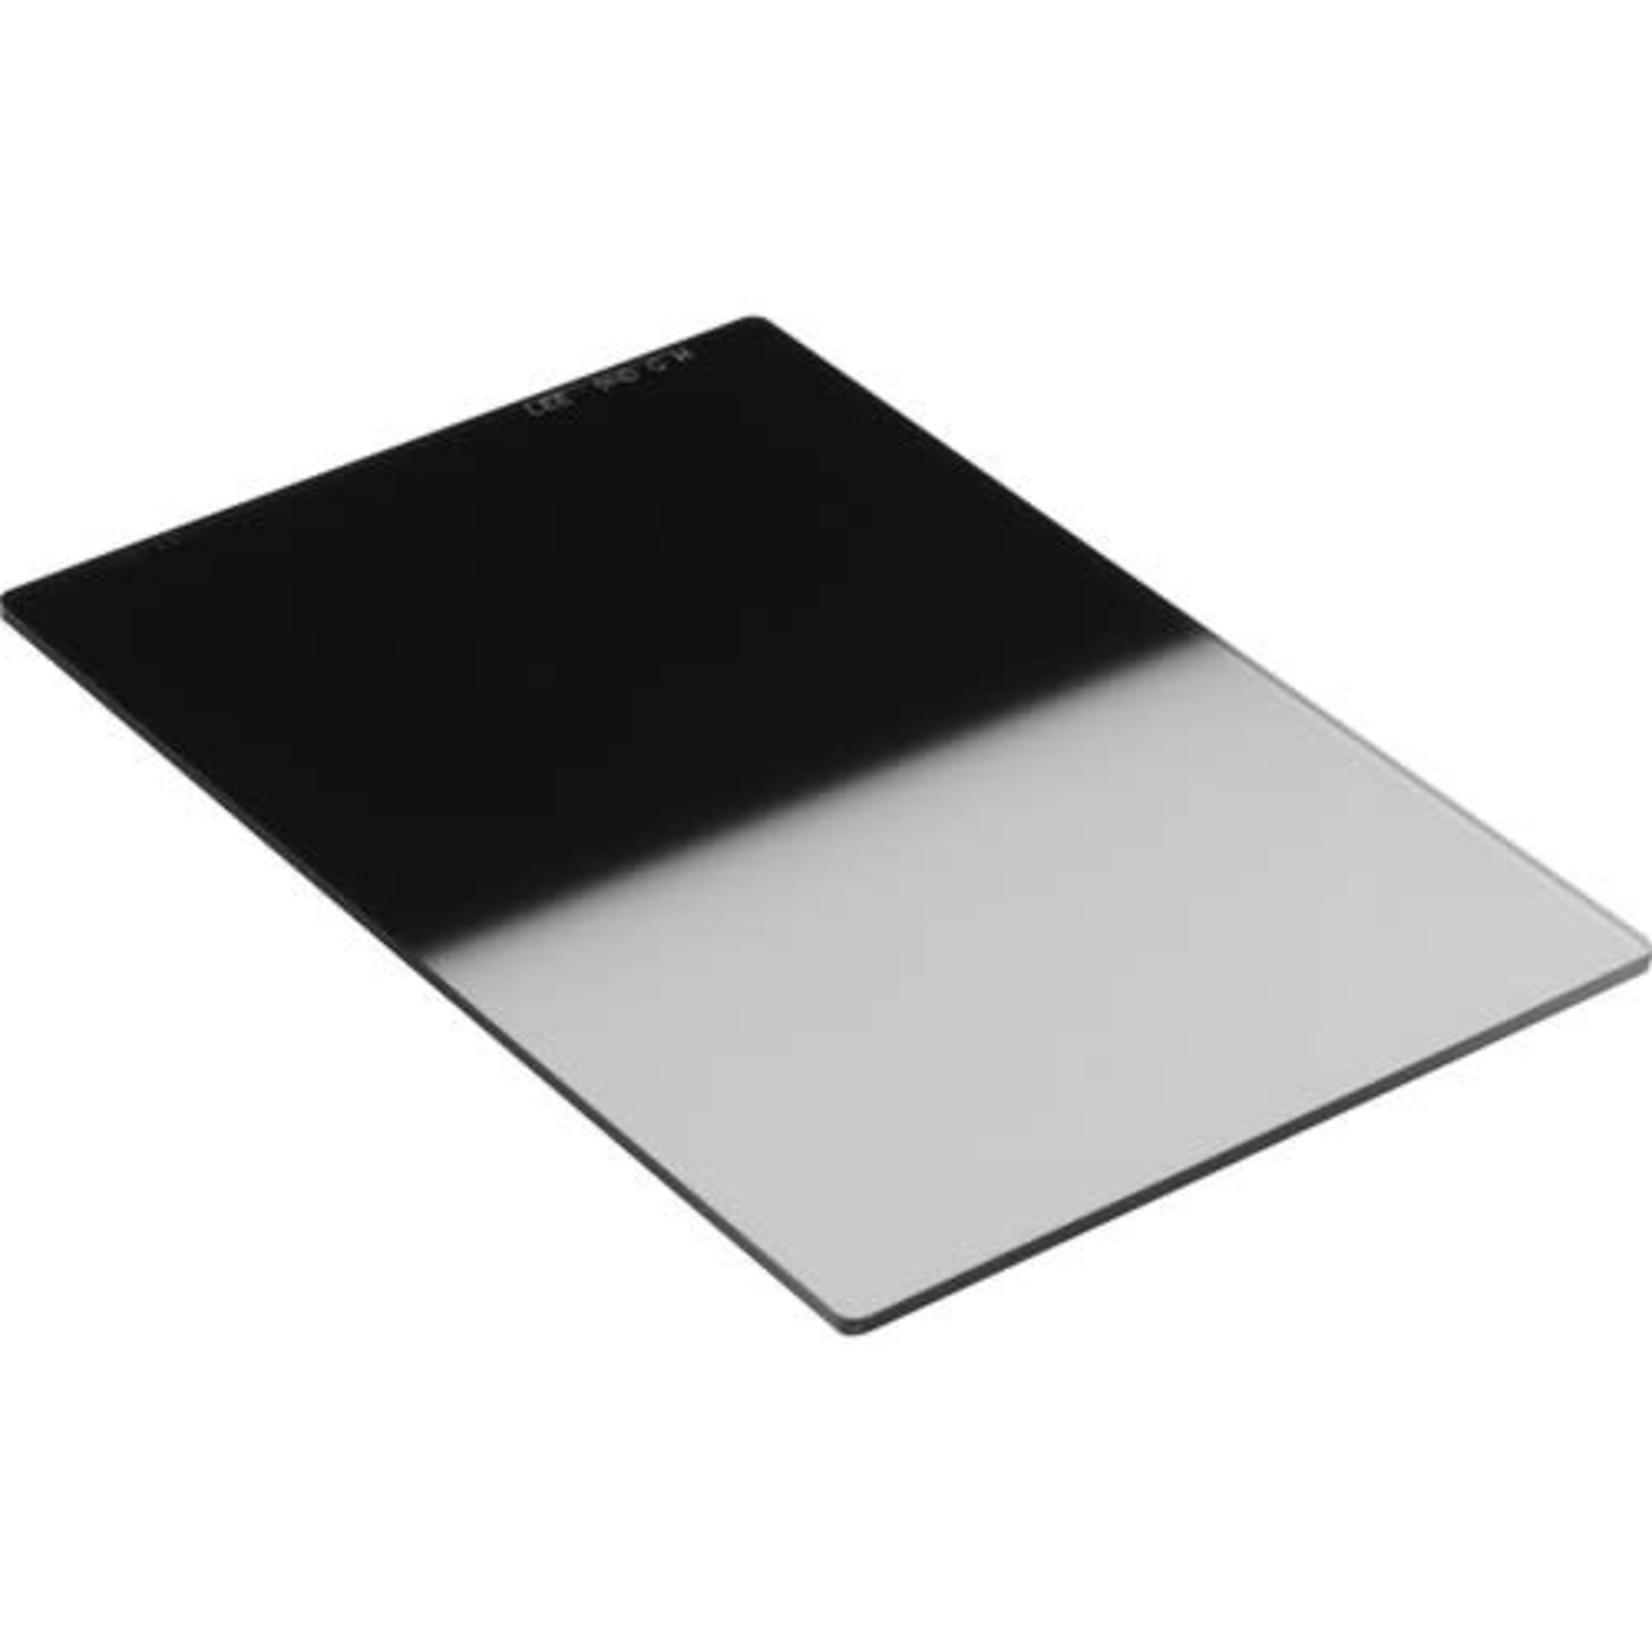 Lee LEE Filters 100 x 150mm Hard Graduated Neutral Density 0.9 Filter